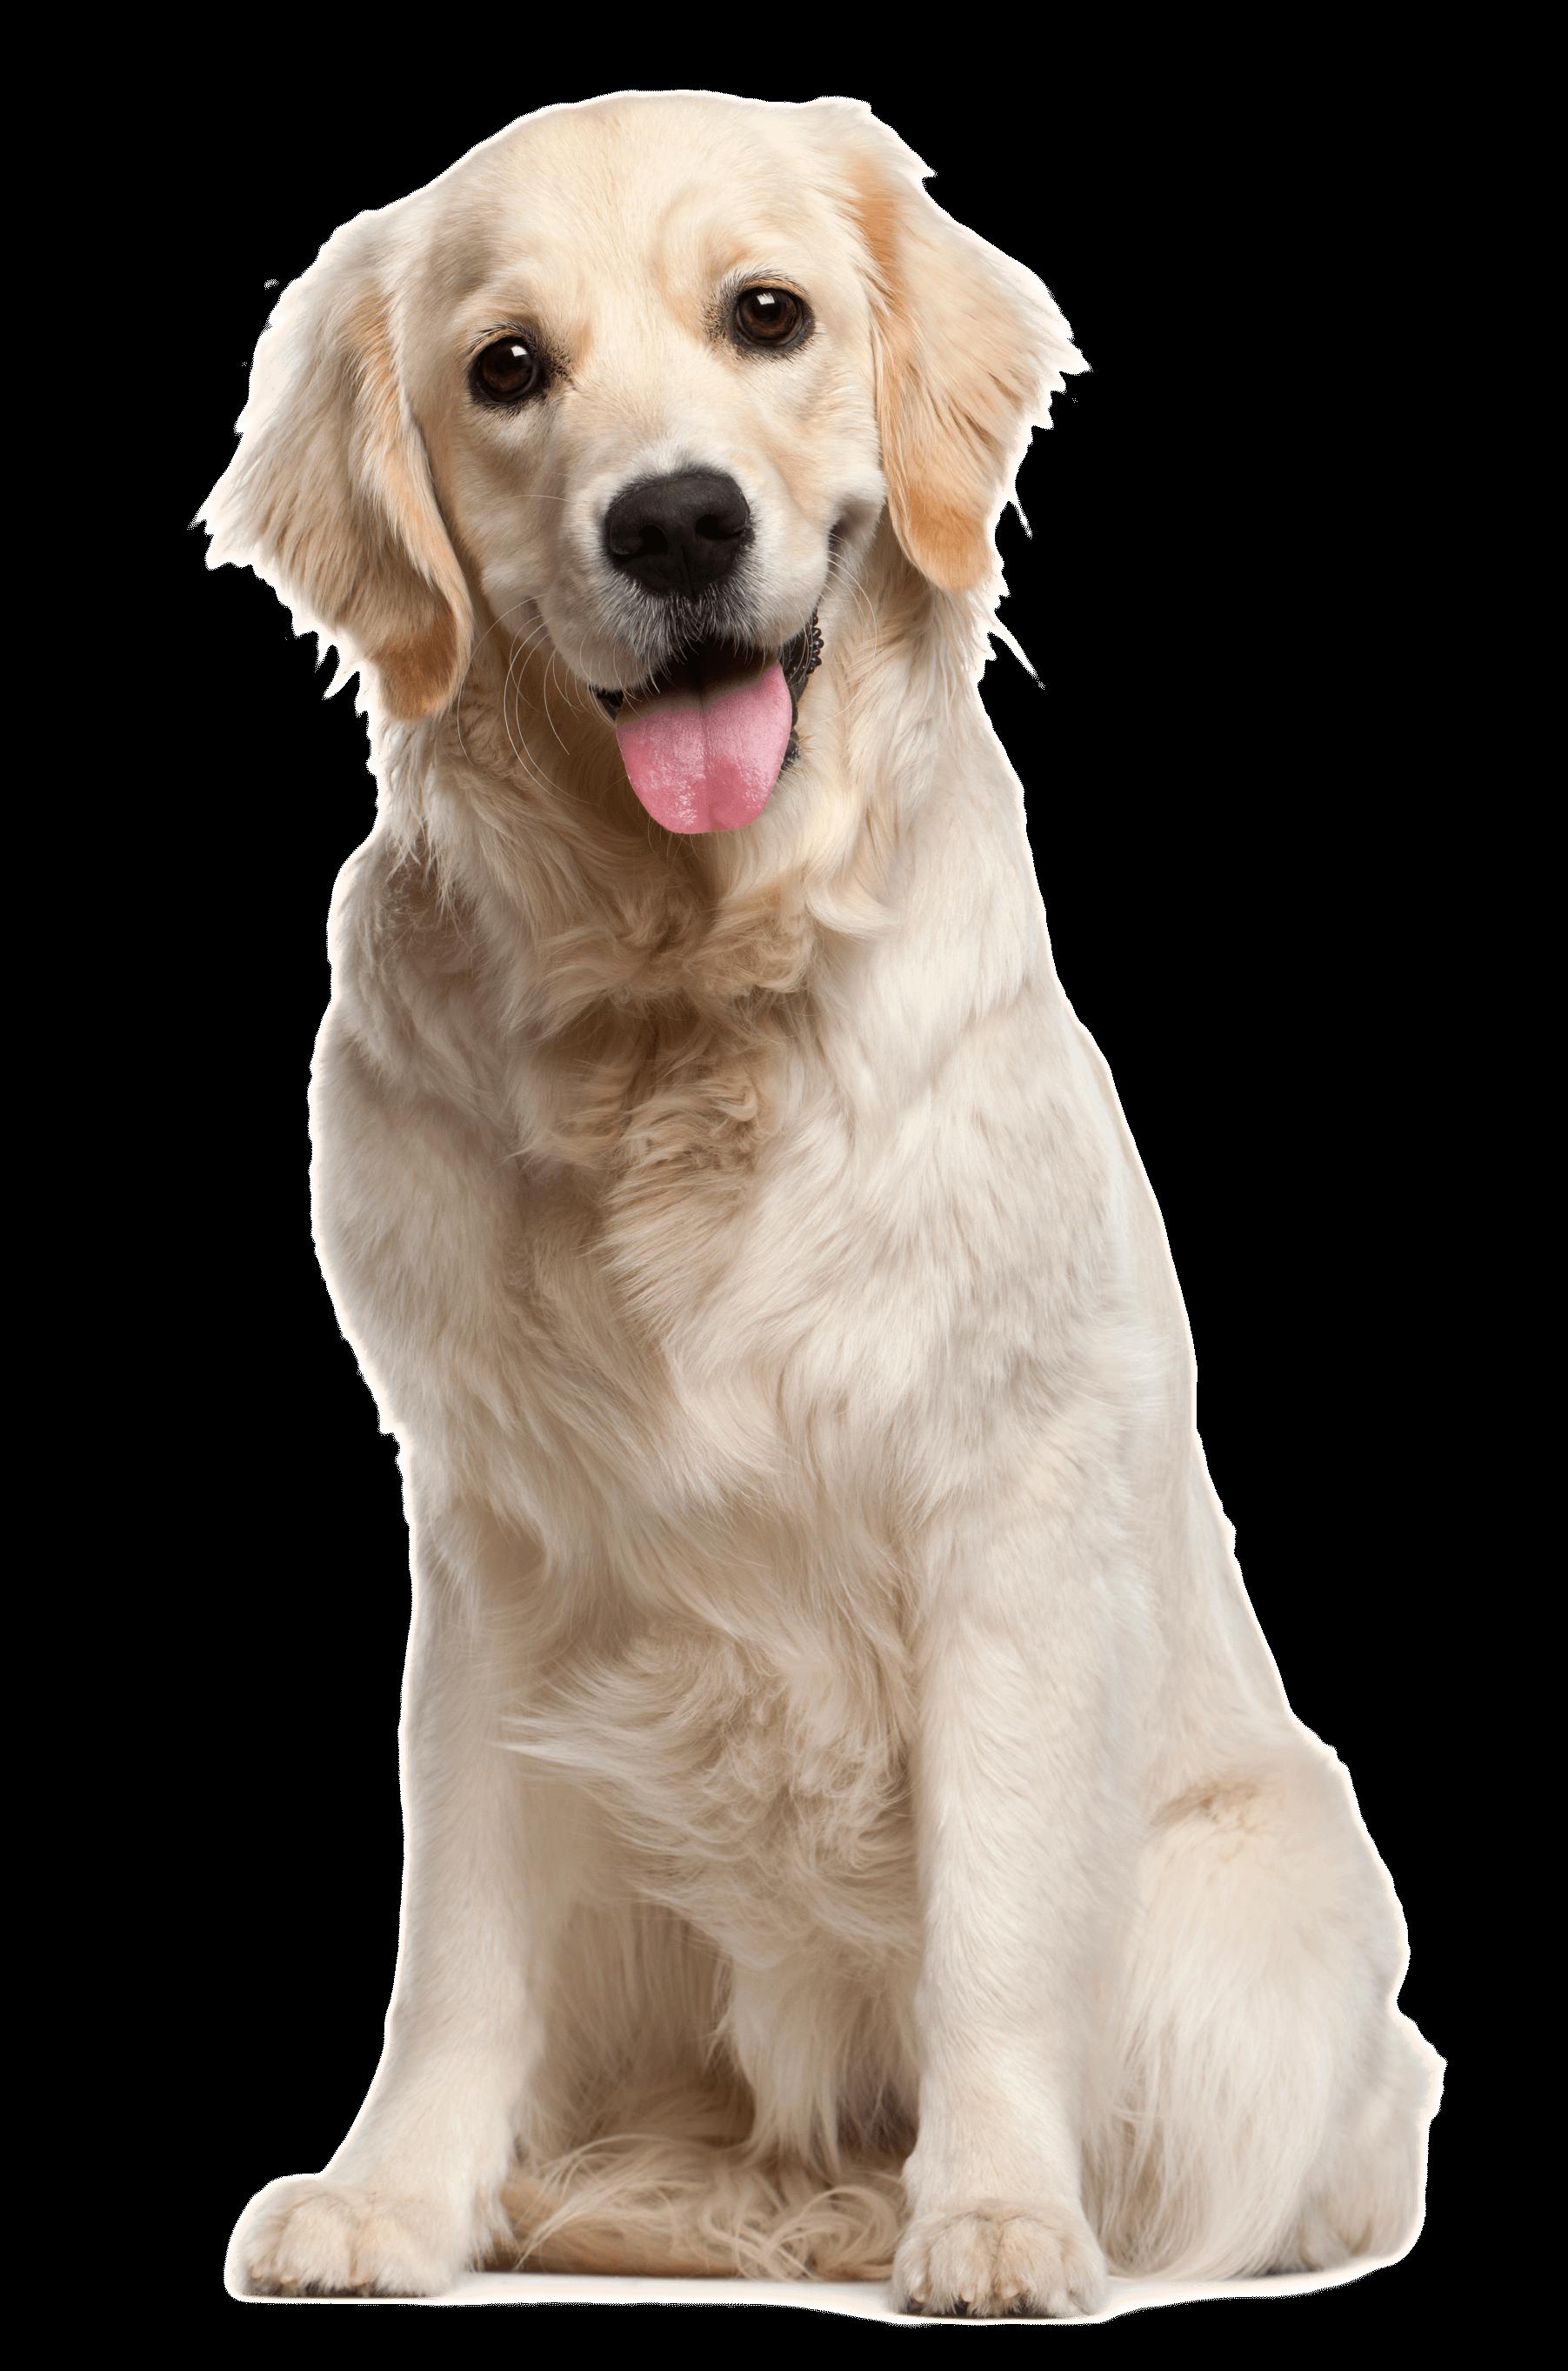 Dog PNG File - Golden Retriever PNG